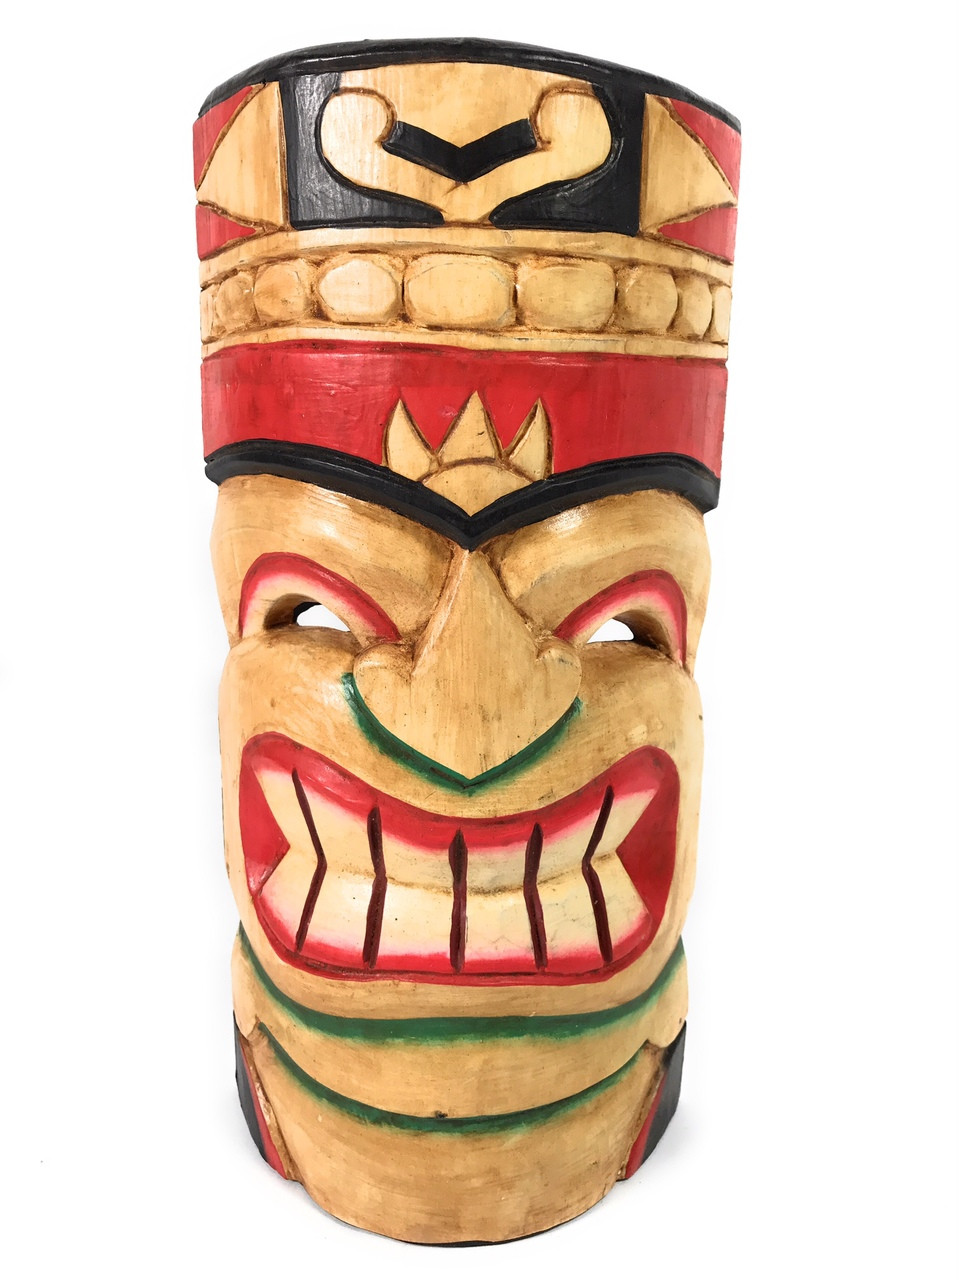 polynesian tiki mask 12 hawaiian decor dpt514330 tikimaster com